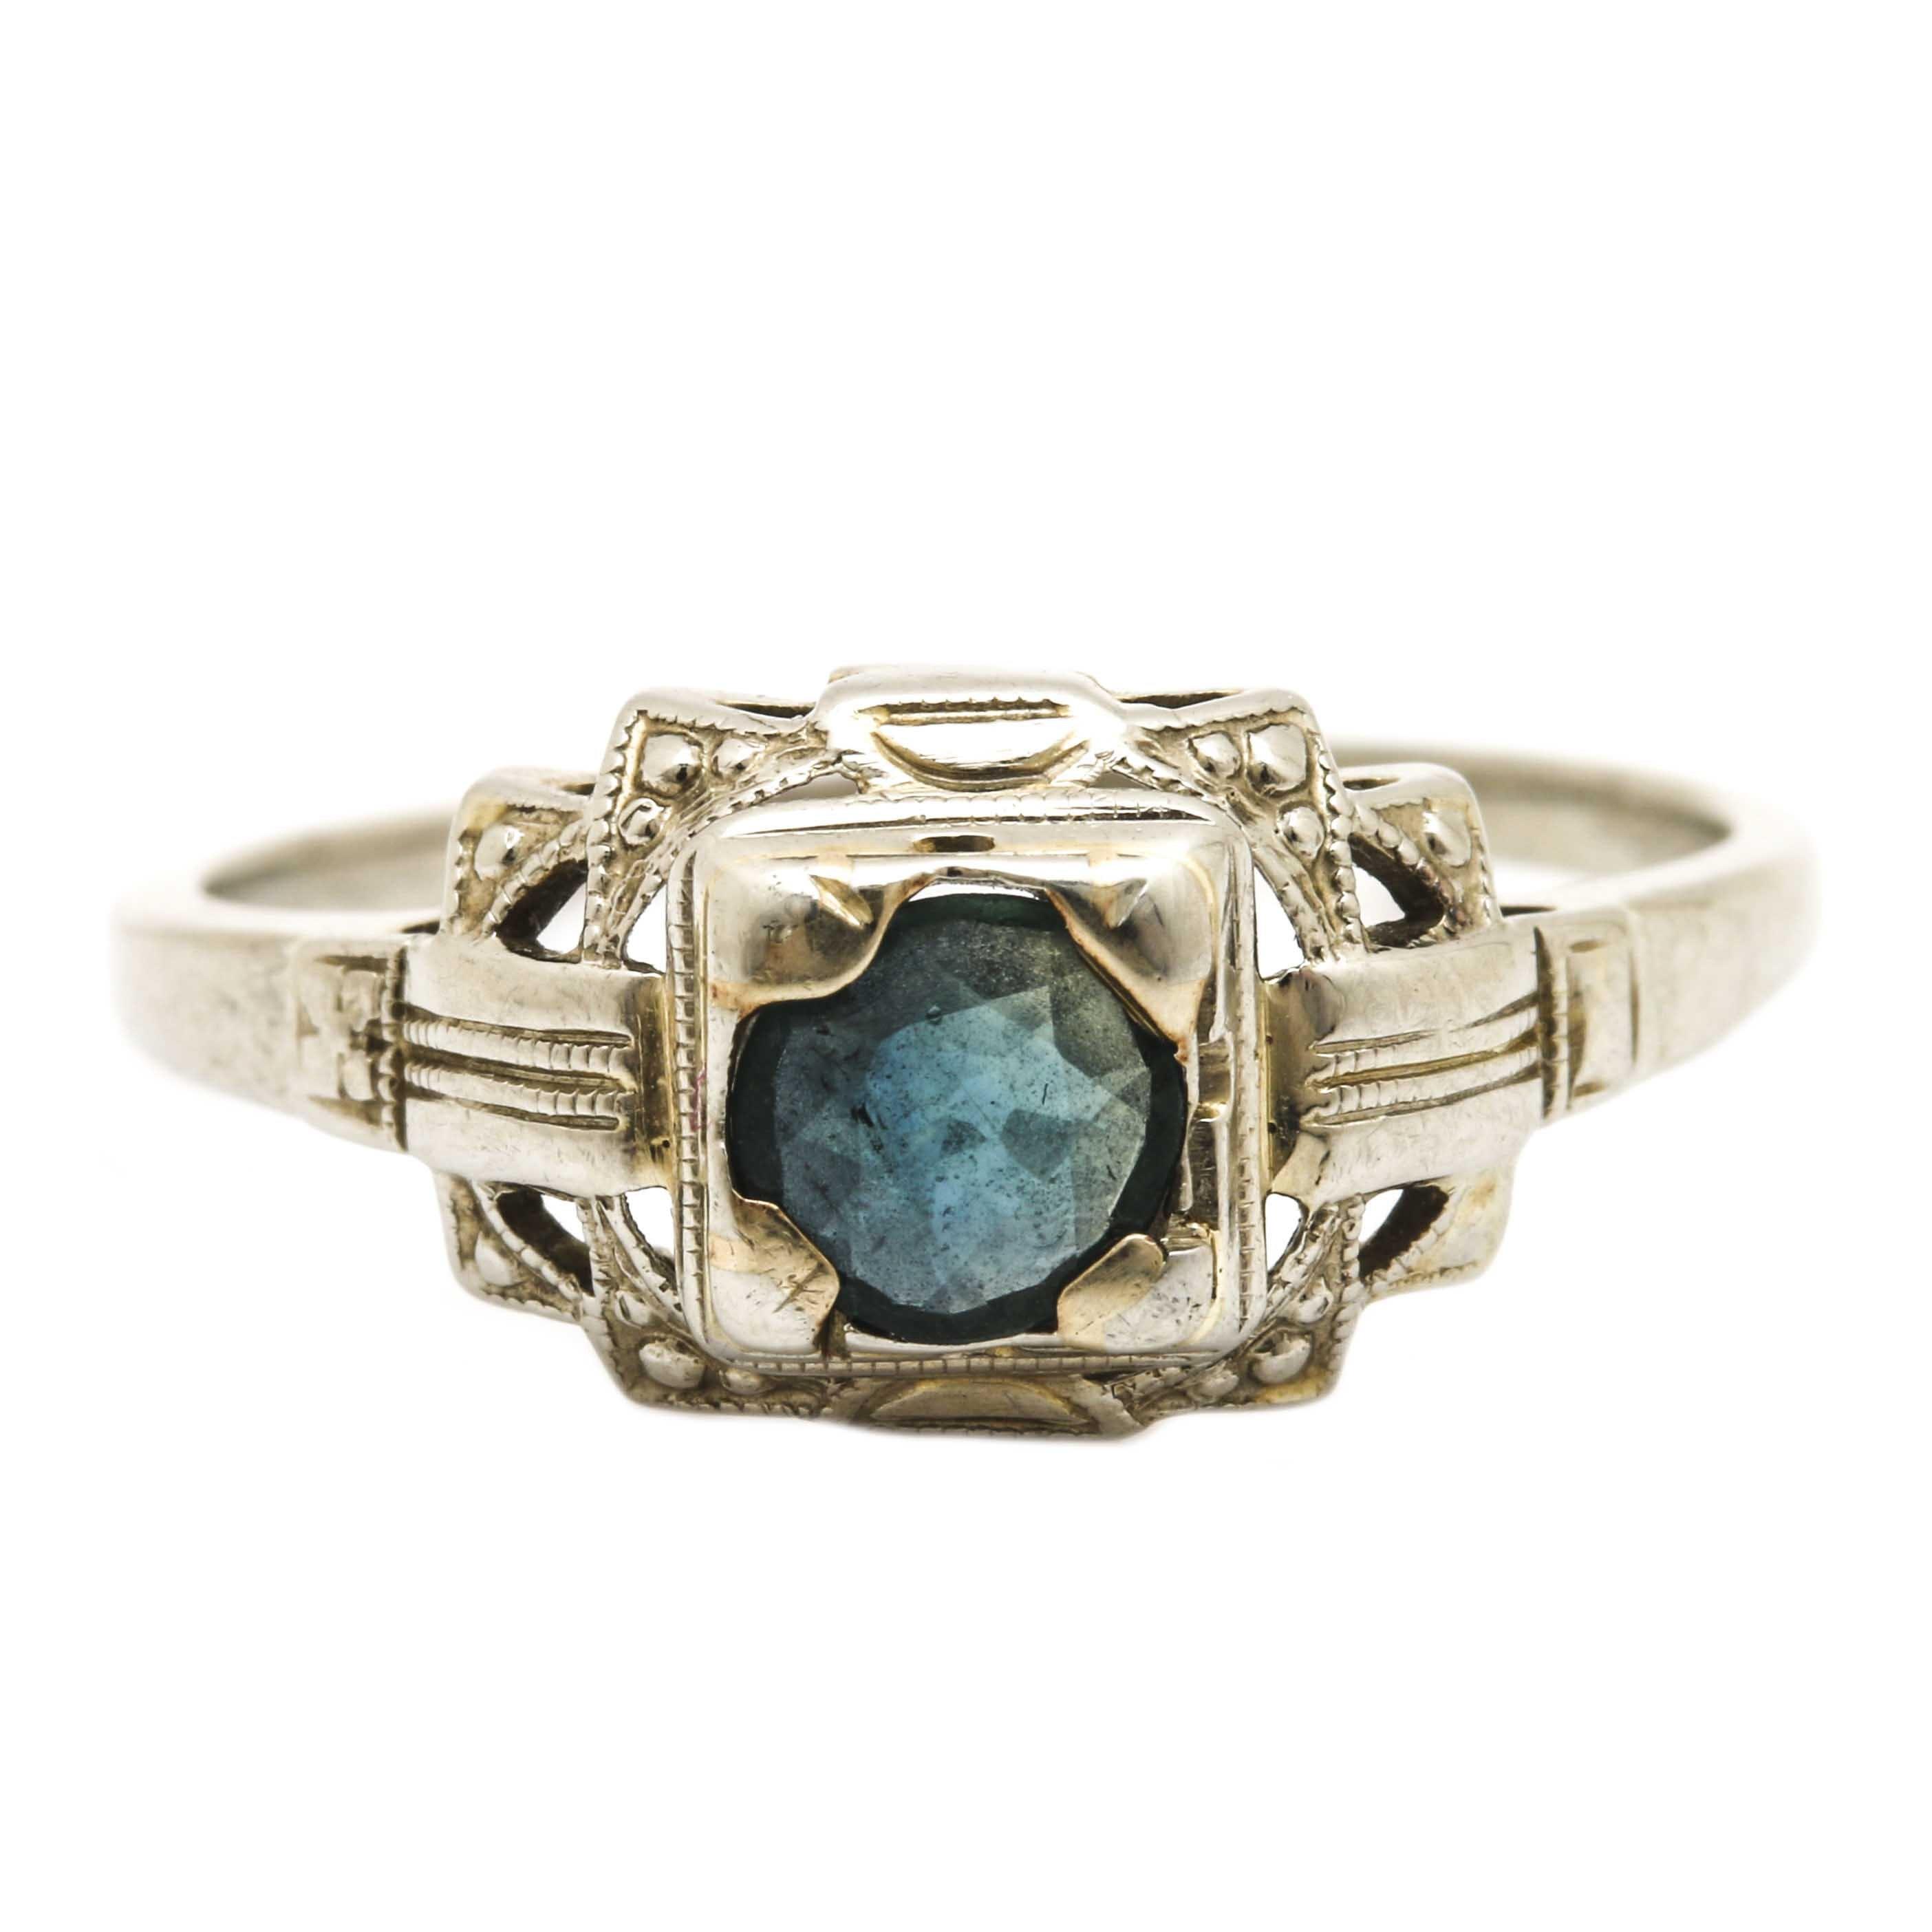 Art Nouveau 18K White Gold Sapphire Ring